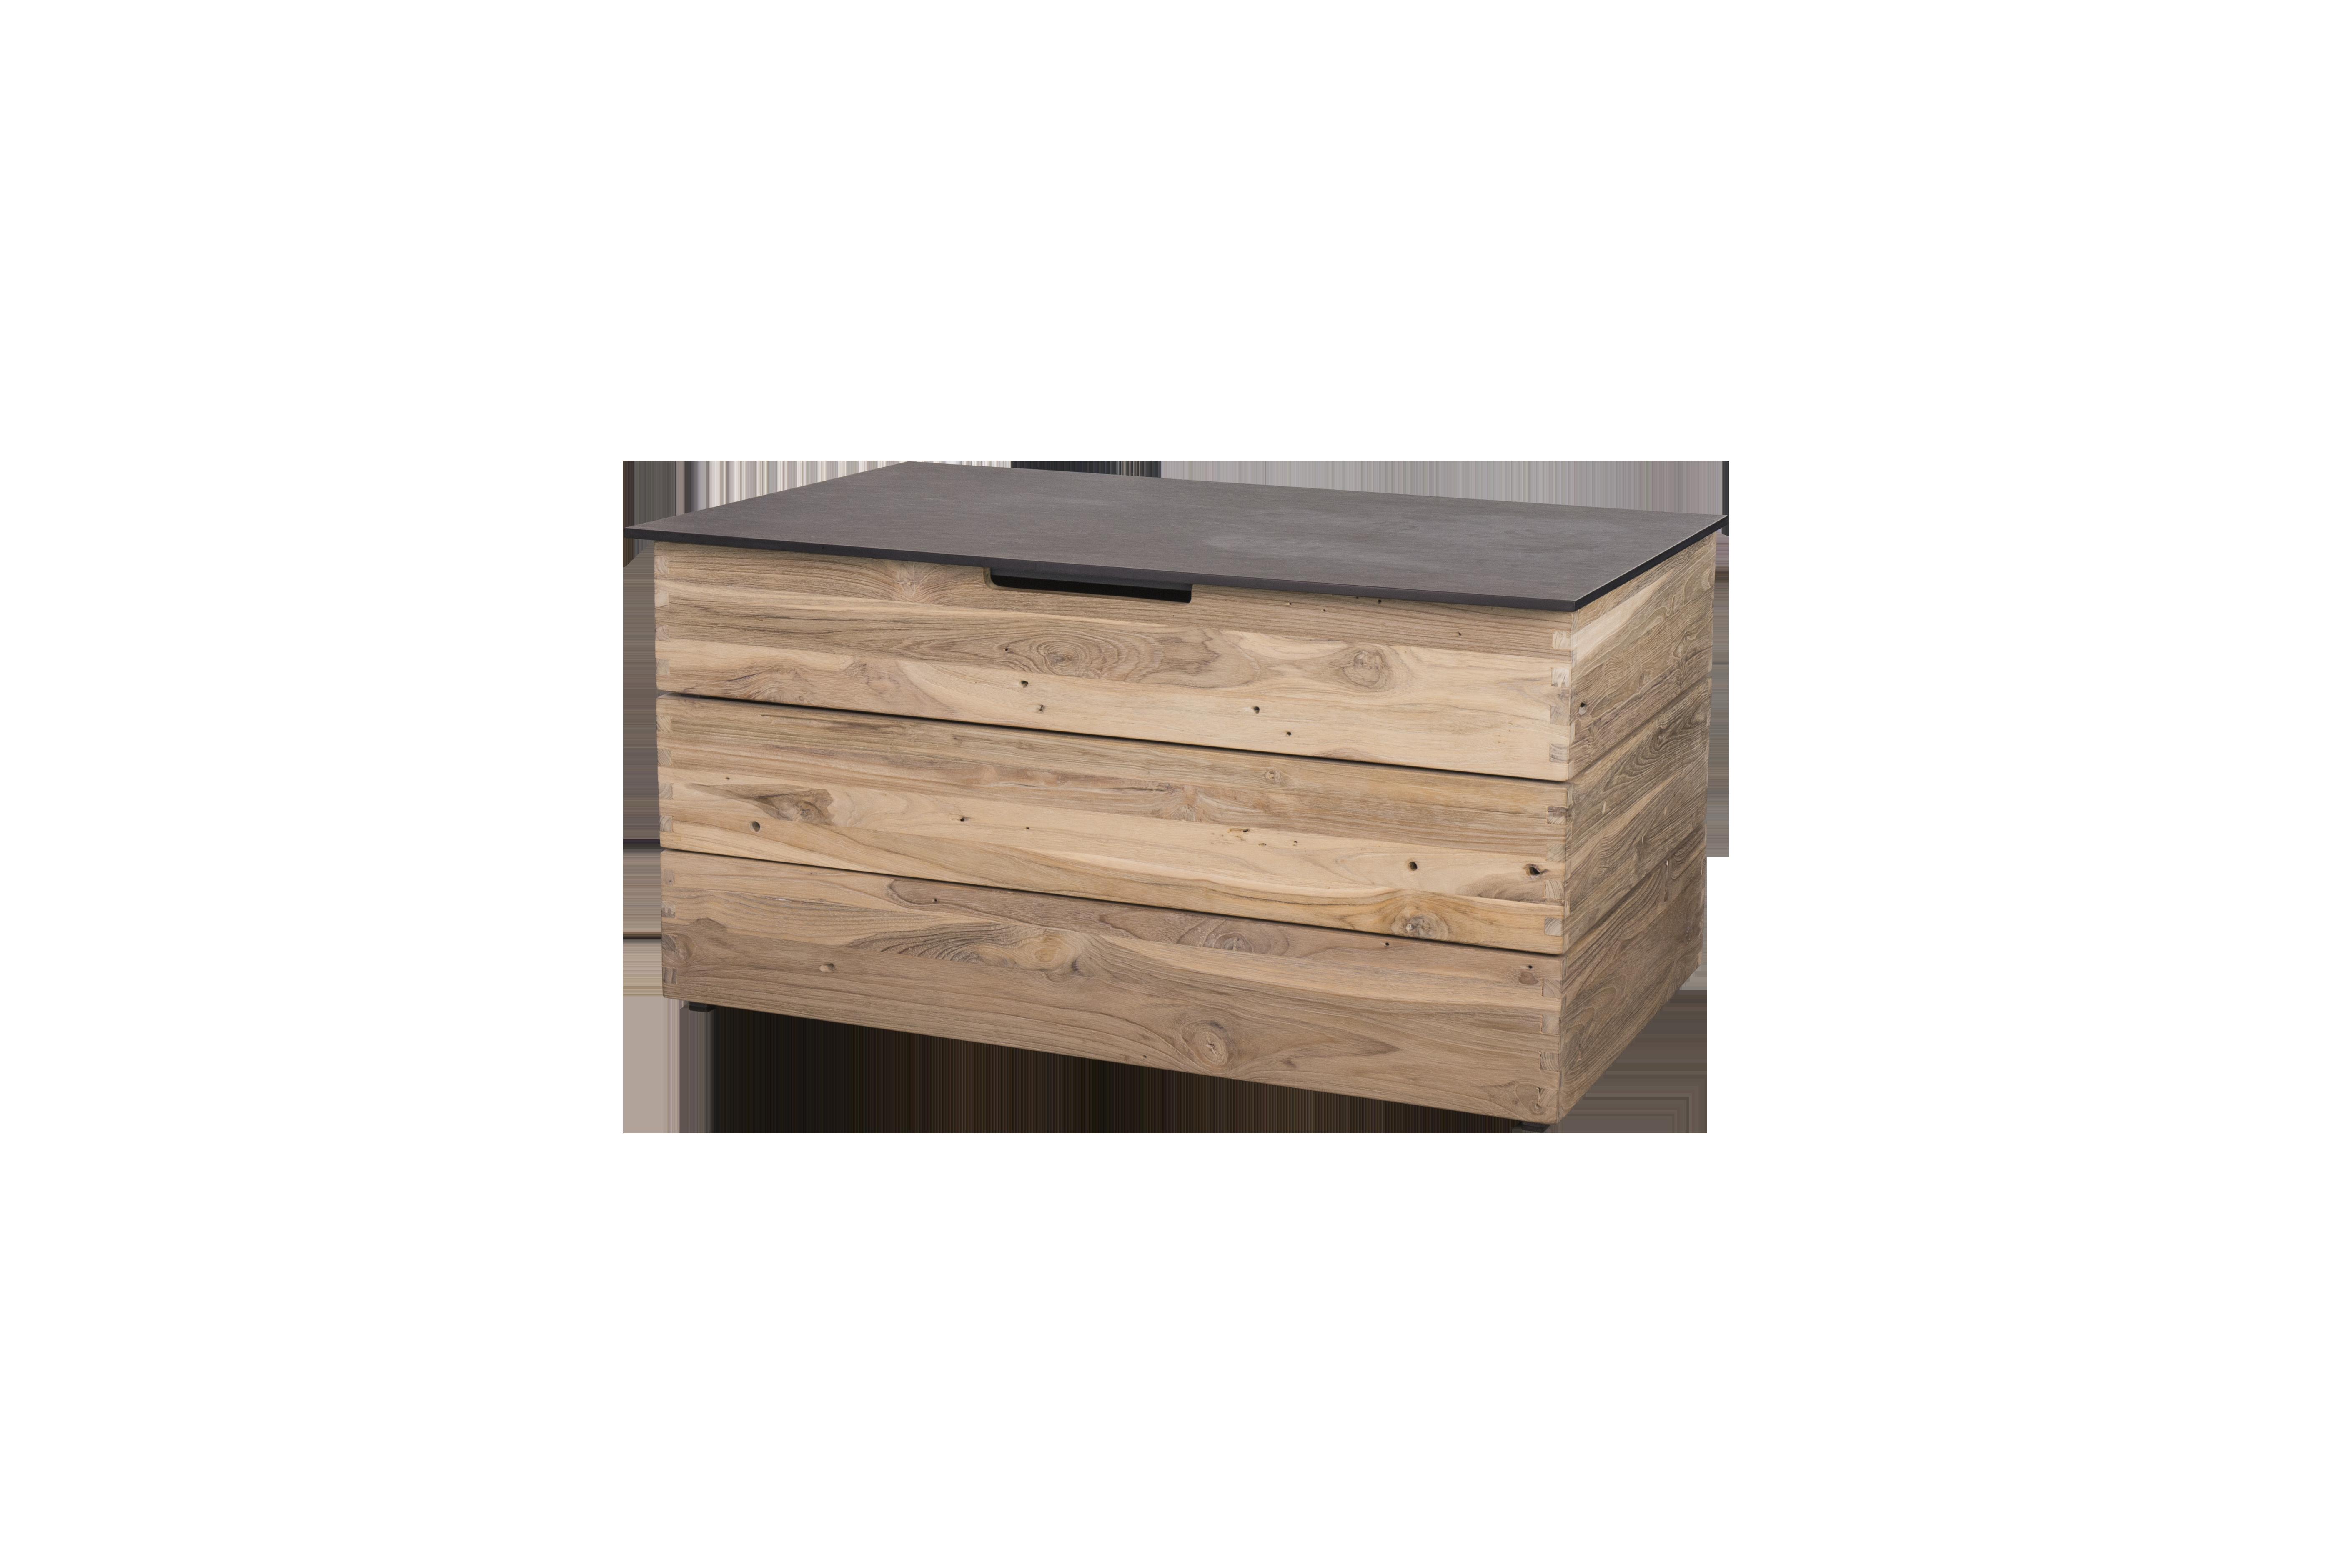 Aiko Cushion Box